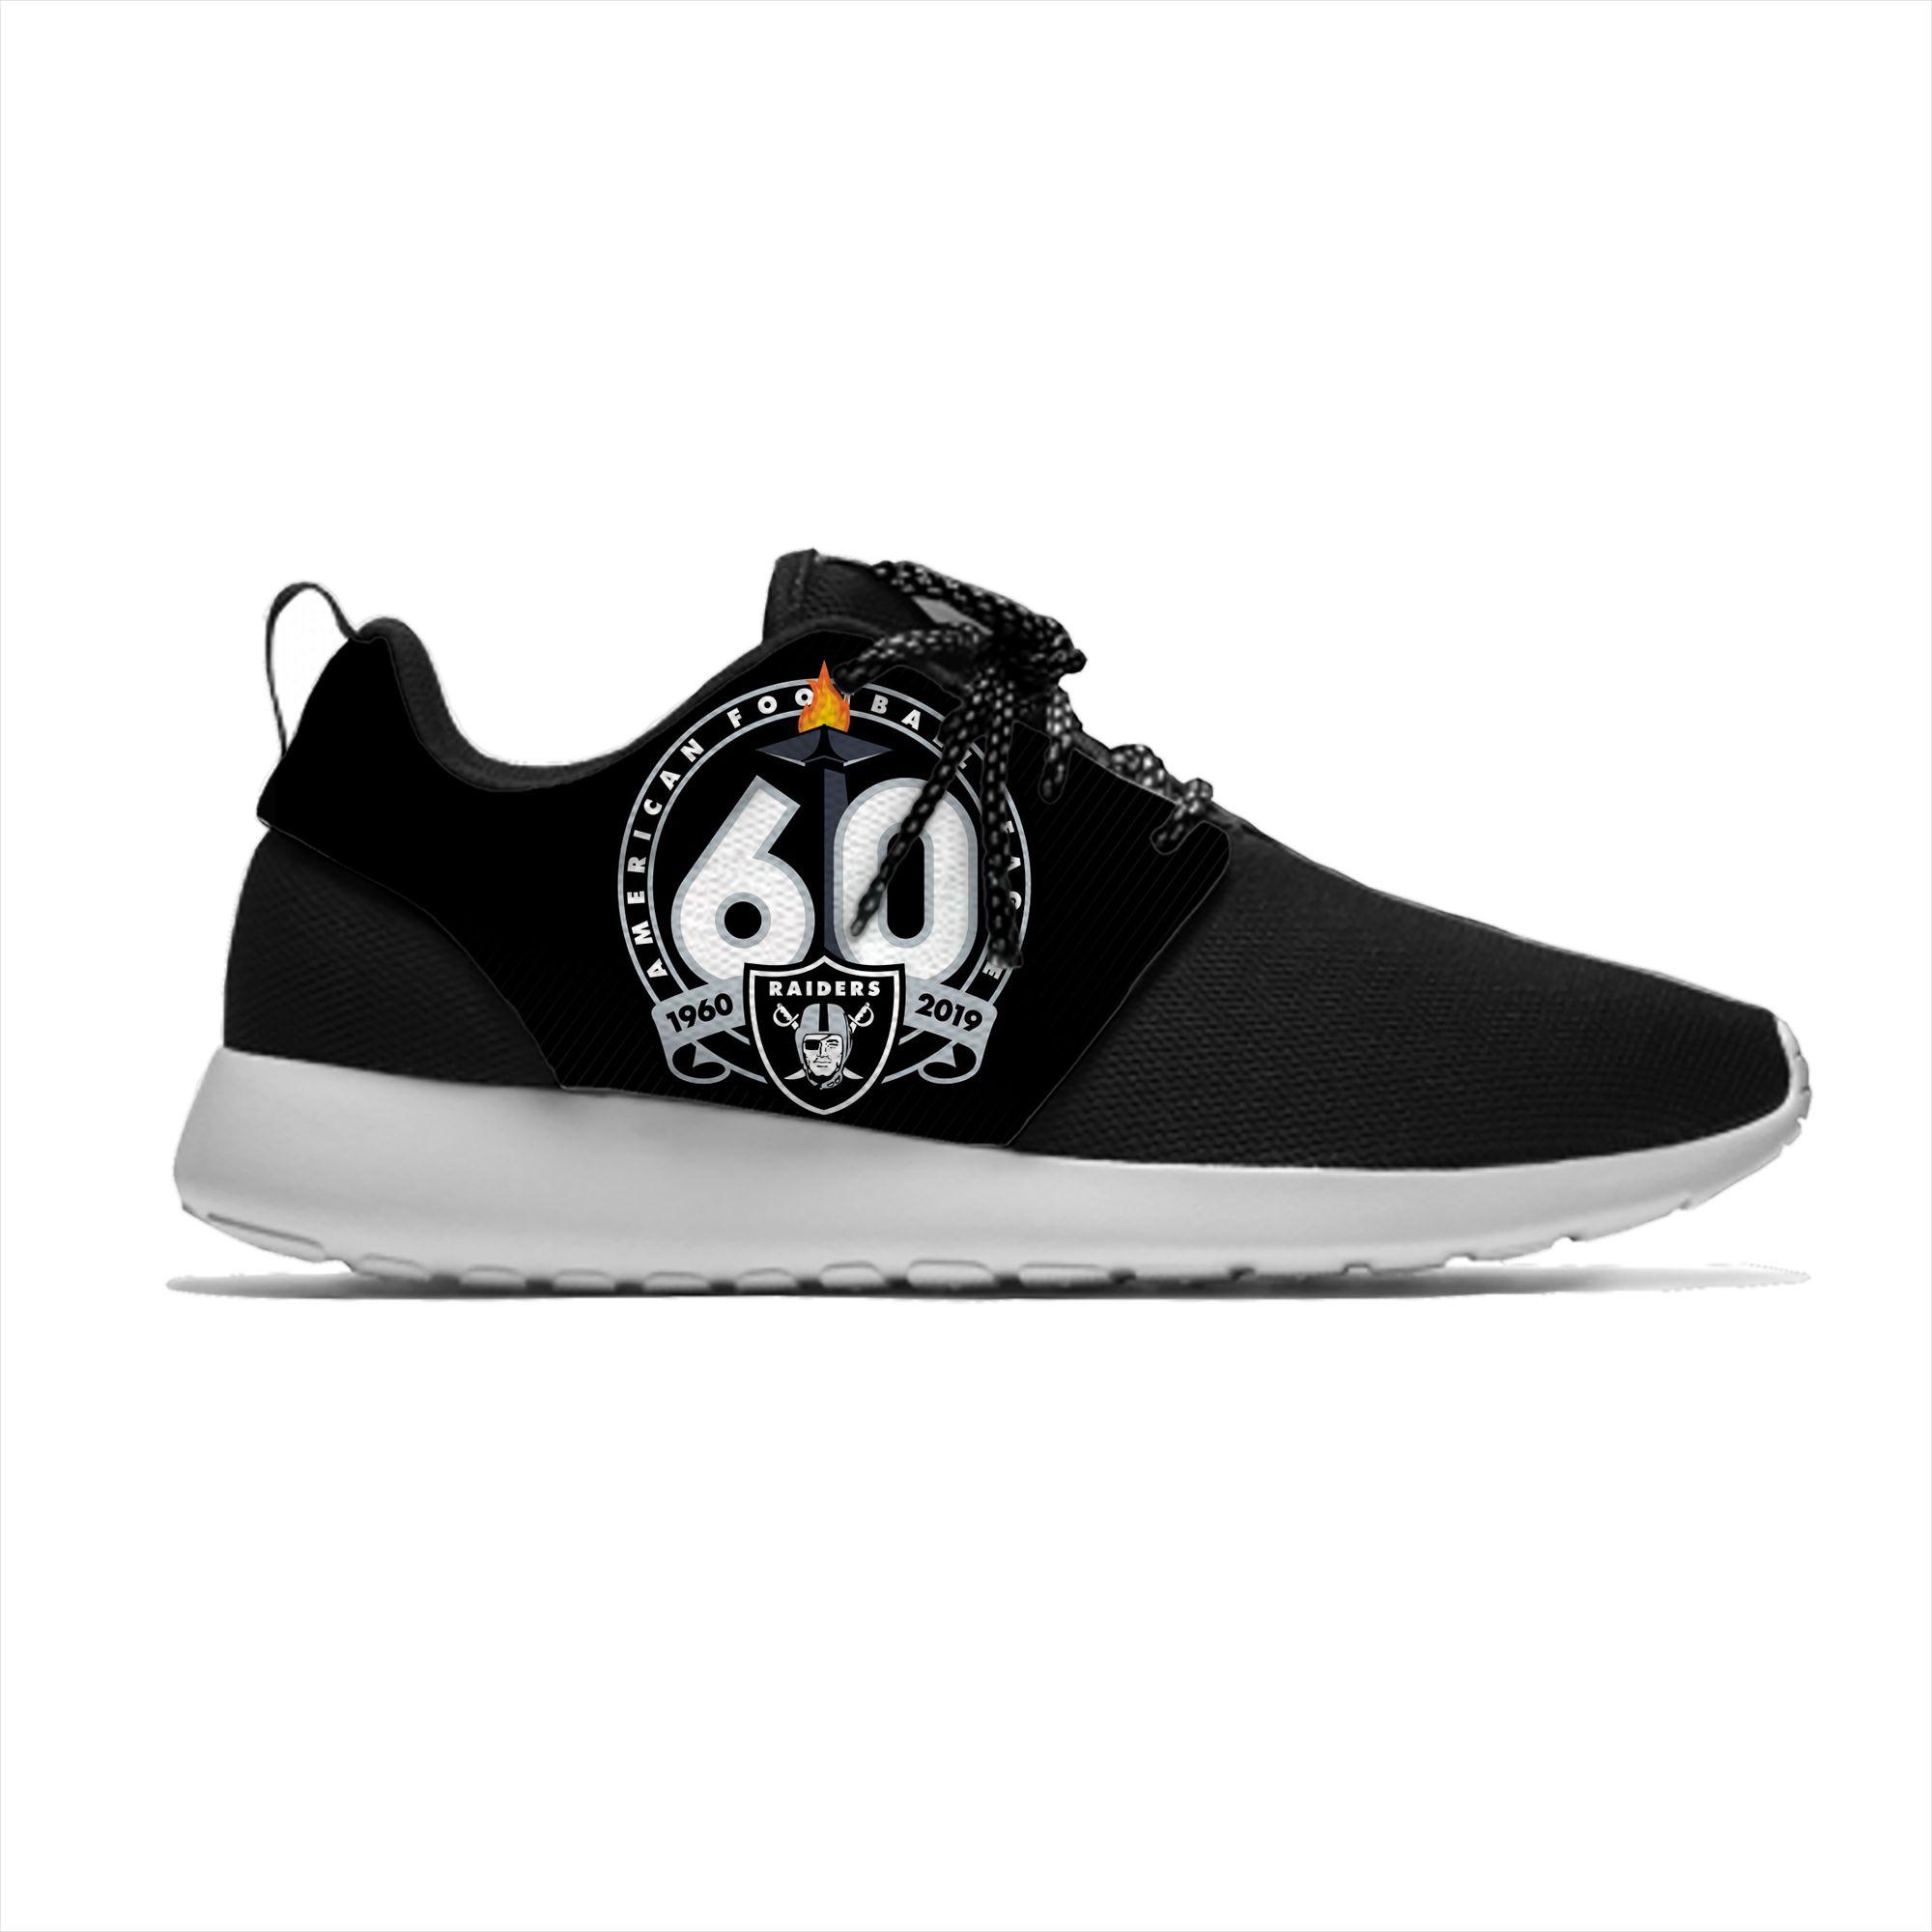 Oakland Raiders Lightweight Sneakers